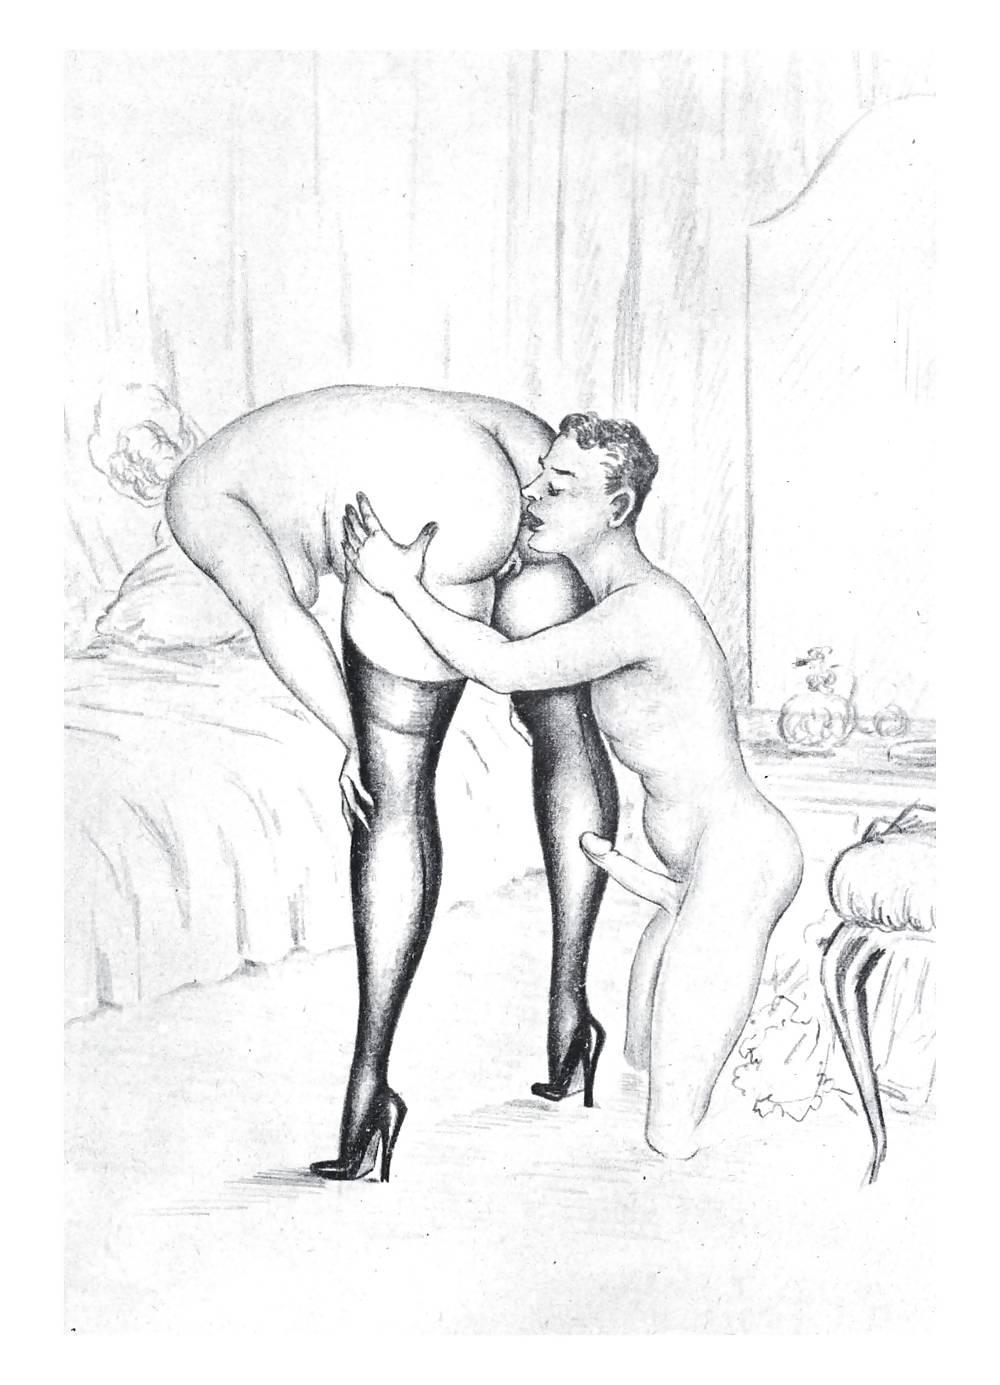 Erotic Vintage drawings Porn Pics #295882